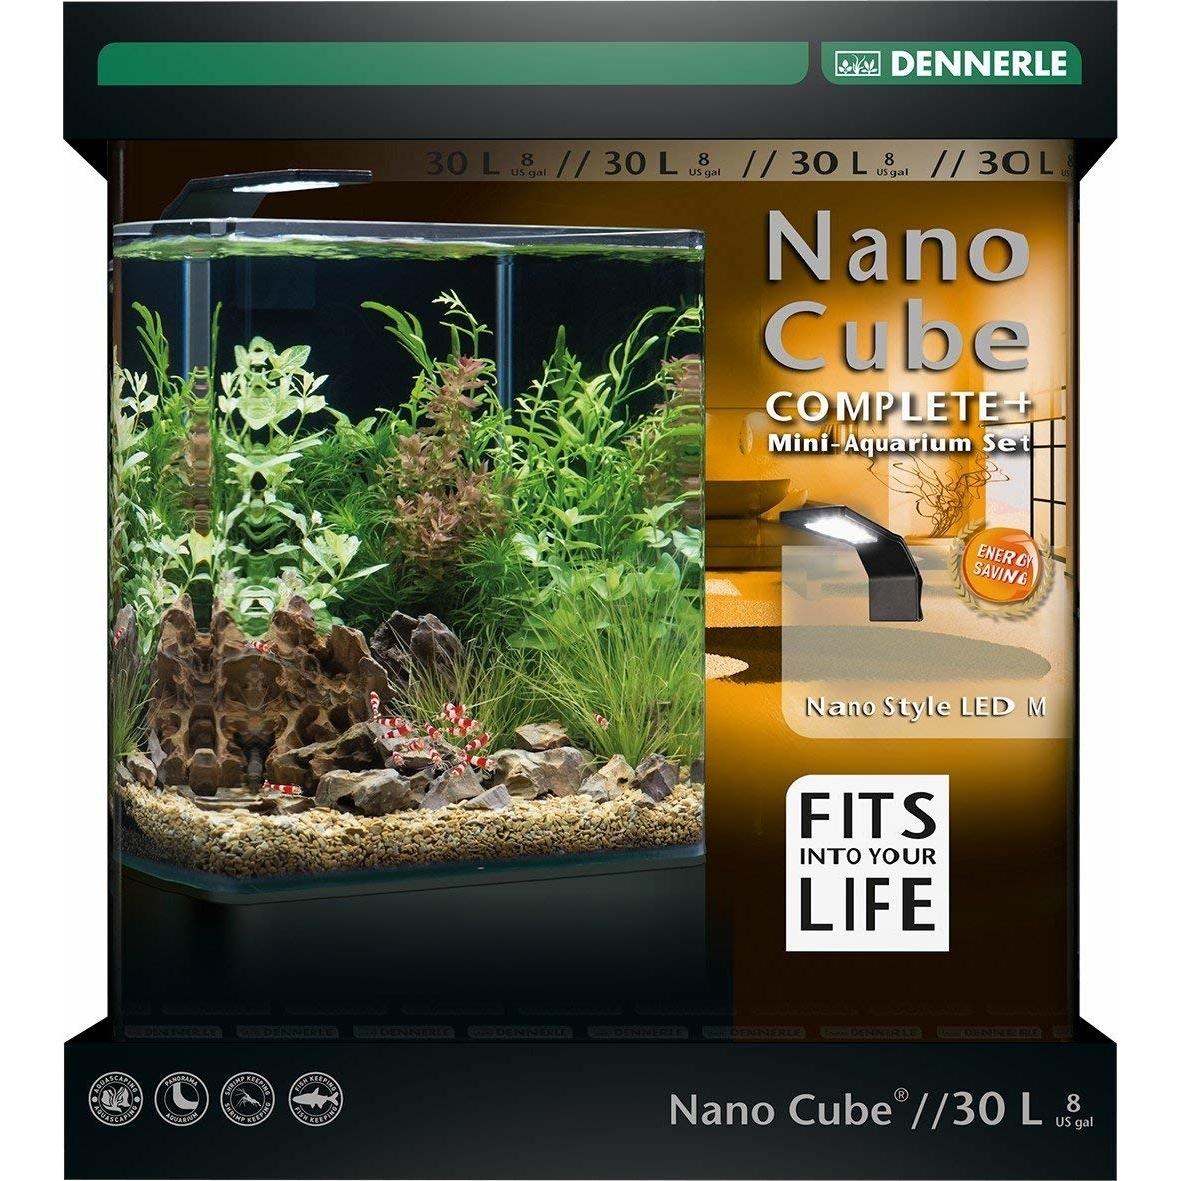 Dennerle NanoCube Complete+ Style LED, Bild 9